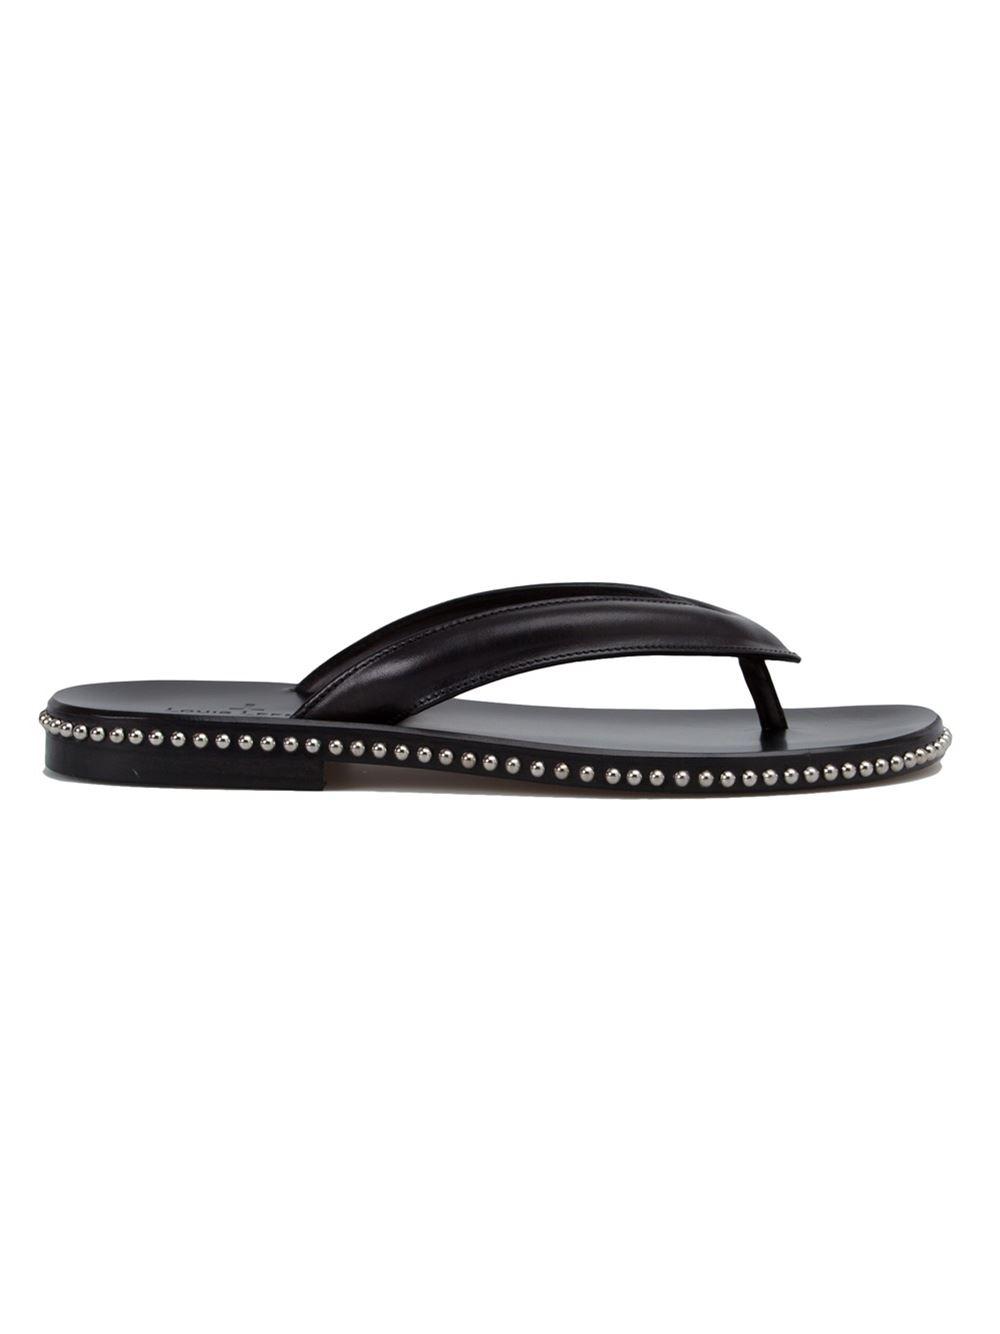 Louis Leeman Studded Flip Flops In Black For Men  Lyst-5302